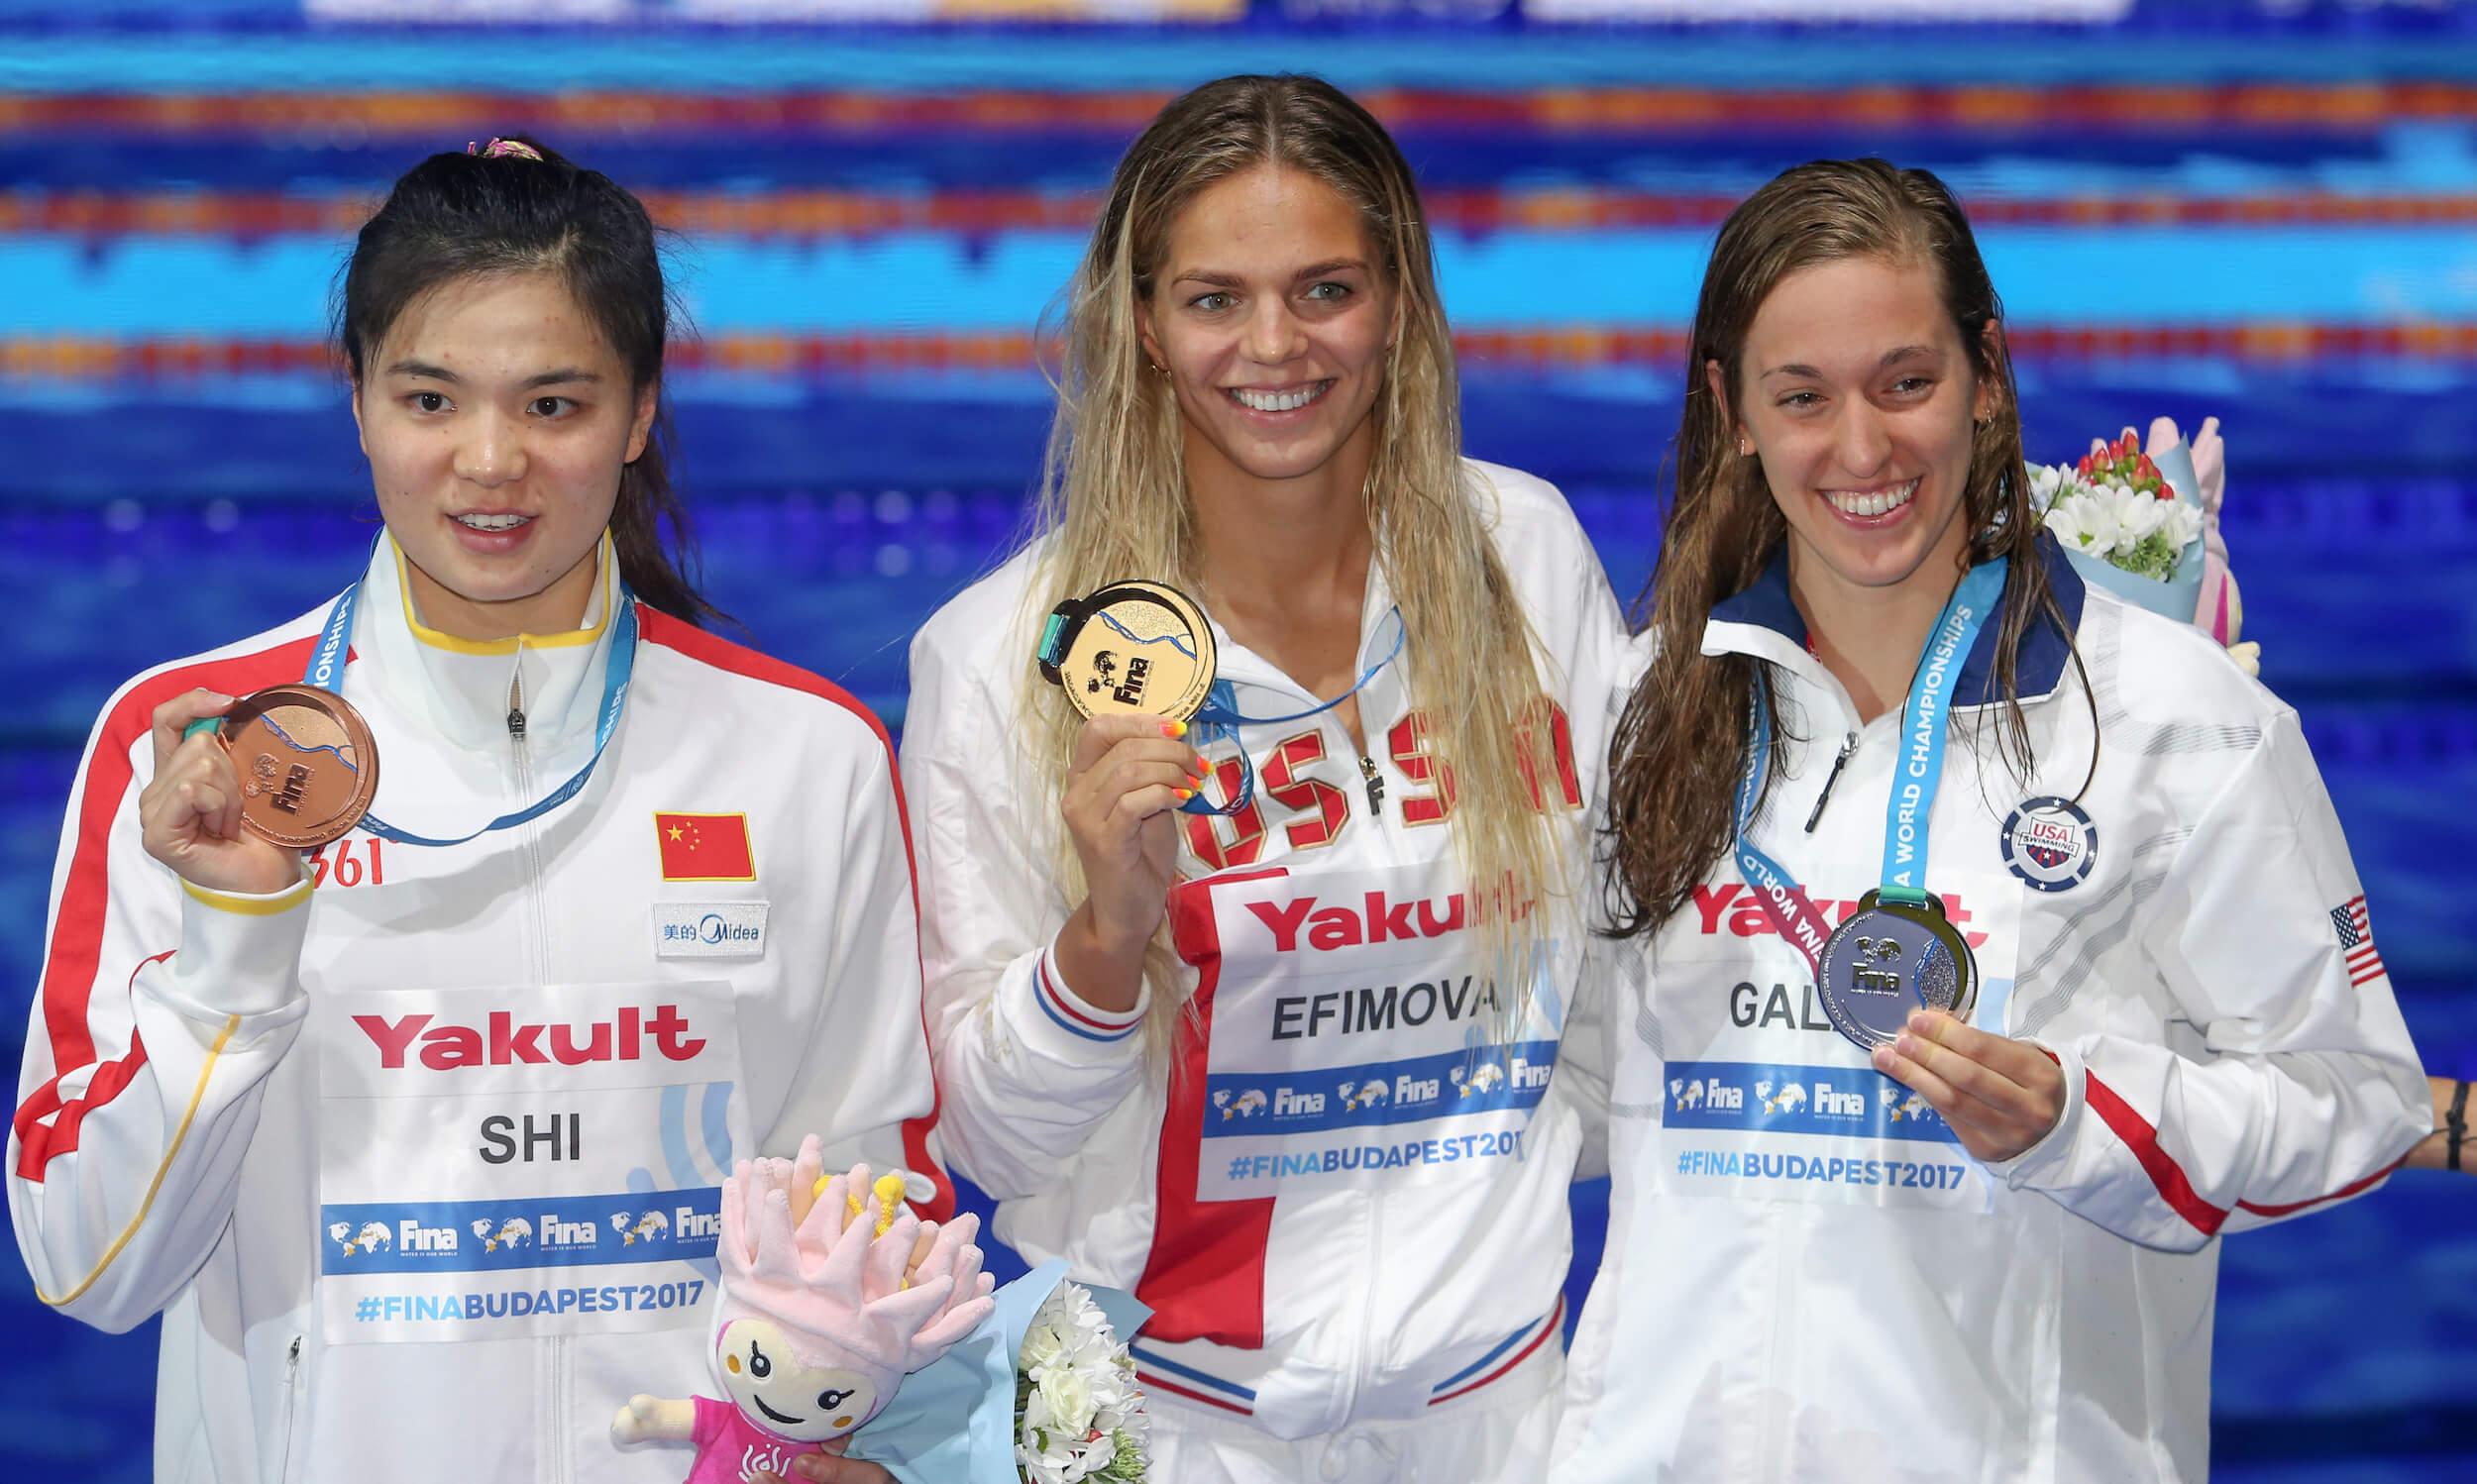 jinglin-shi-chn-yuliya-efimova-rus-bethany-galat-usa-medals-2017-world-champs